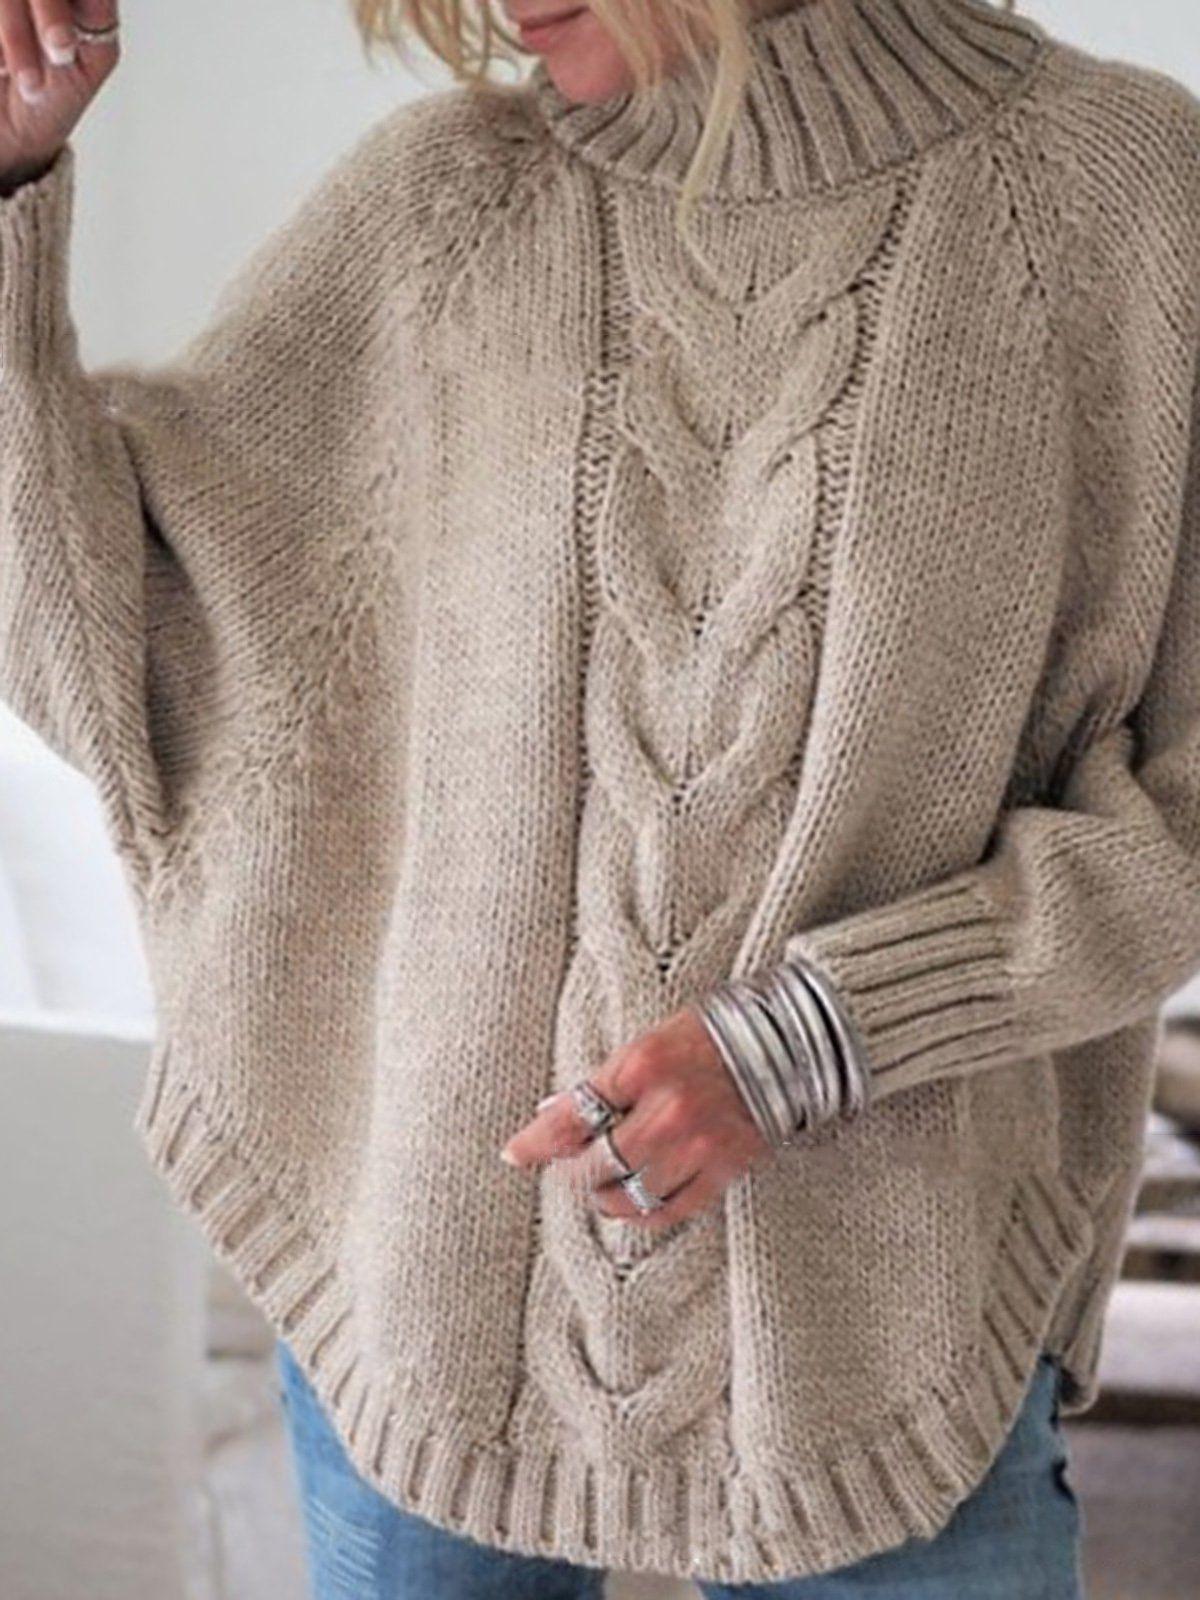 Fubotevic Men Turtleneck Fall Winter Regular Fit Knit Solid Pullover Sweater Jumper